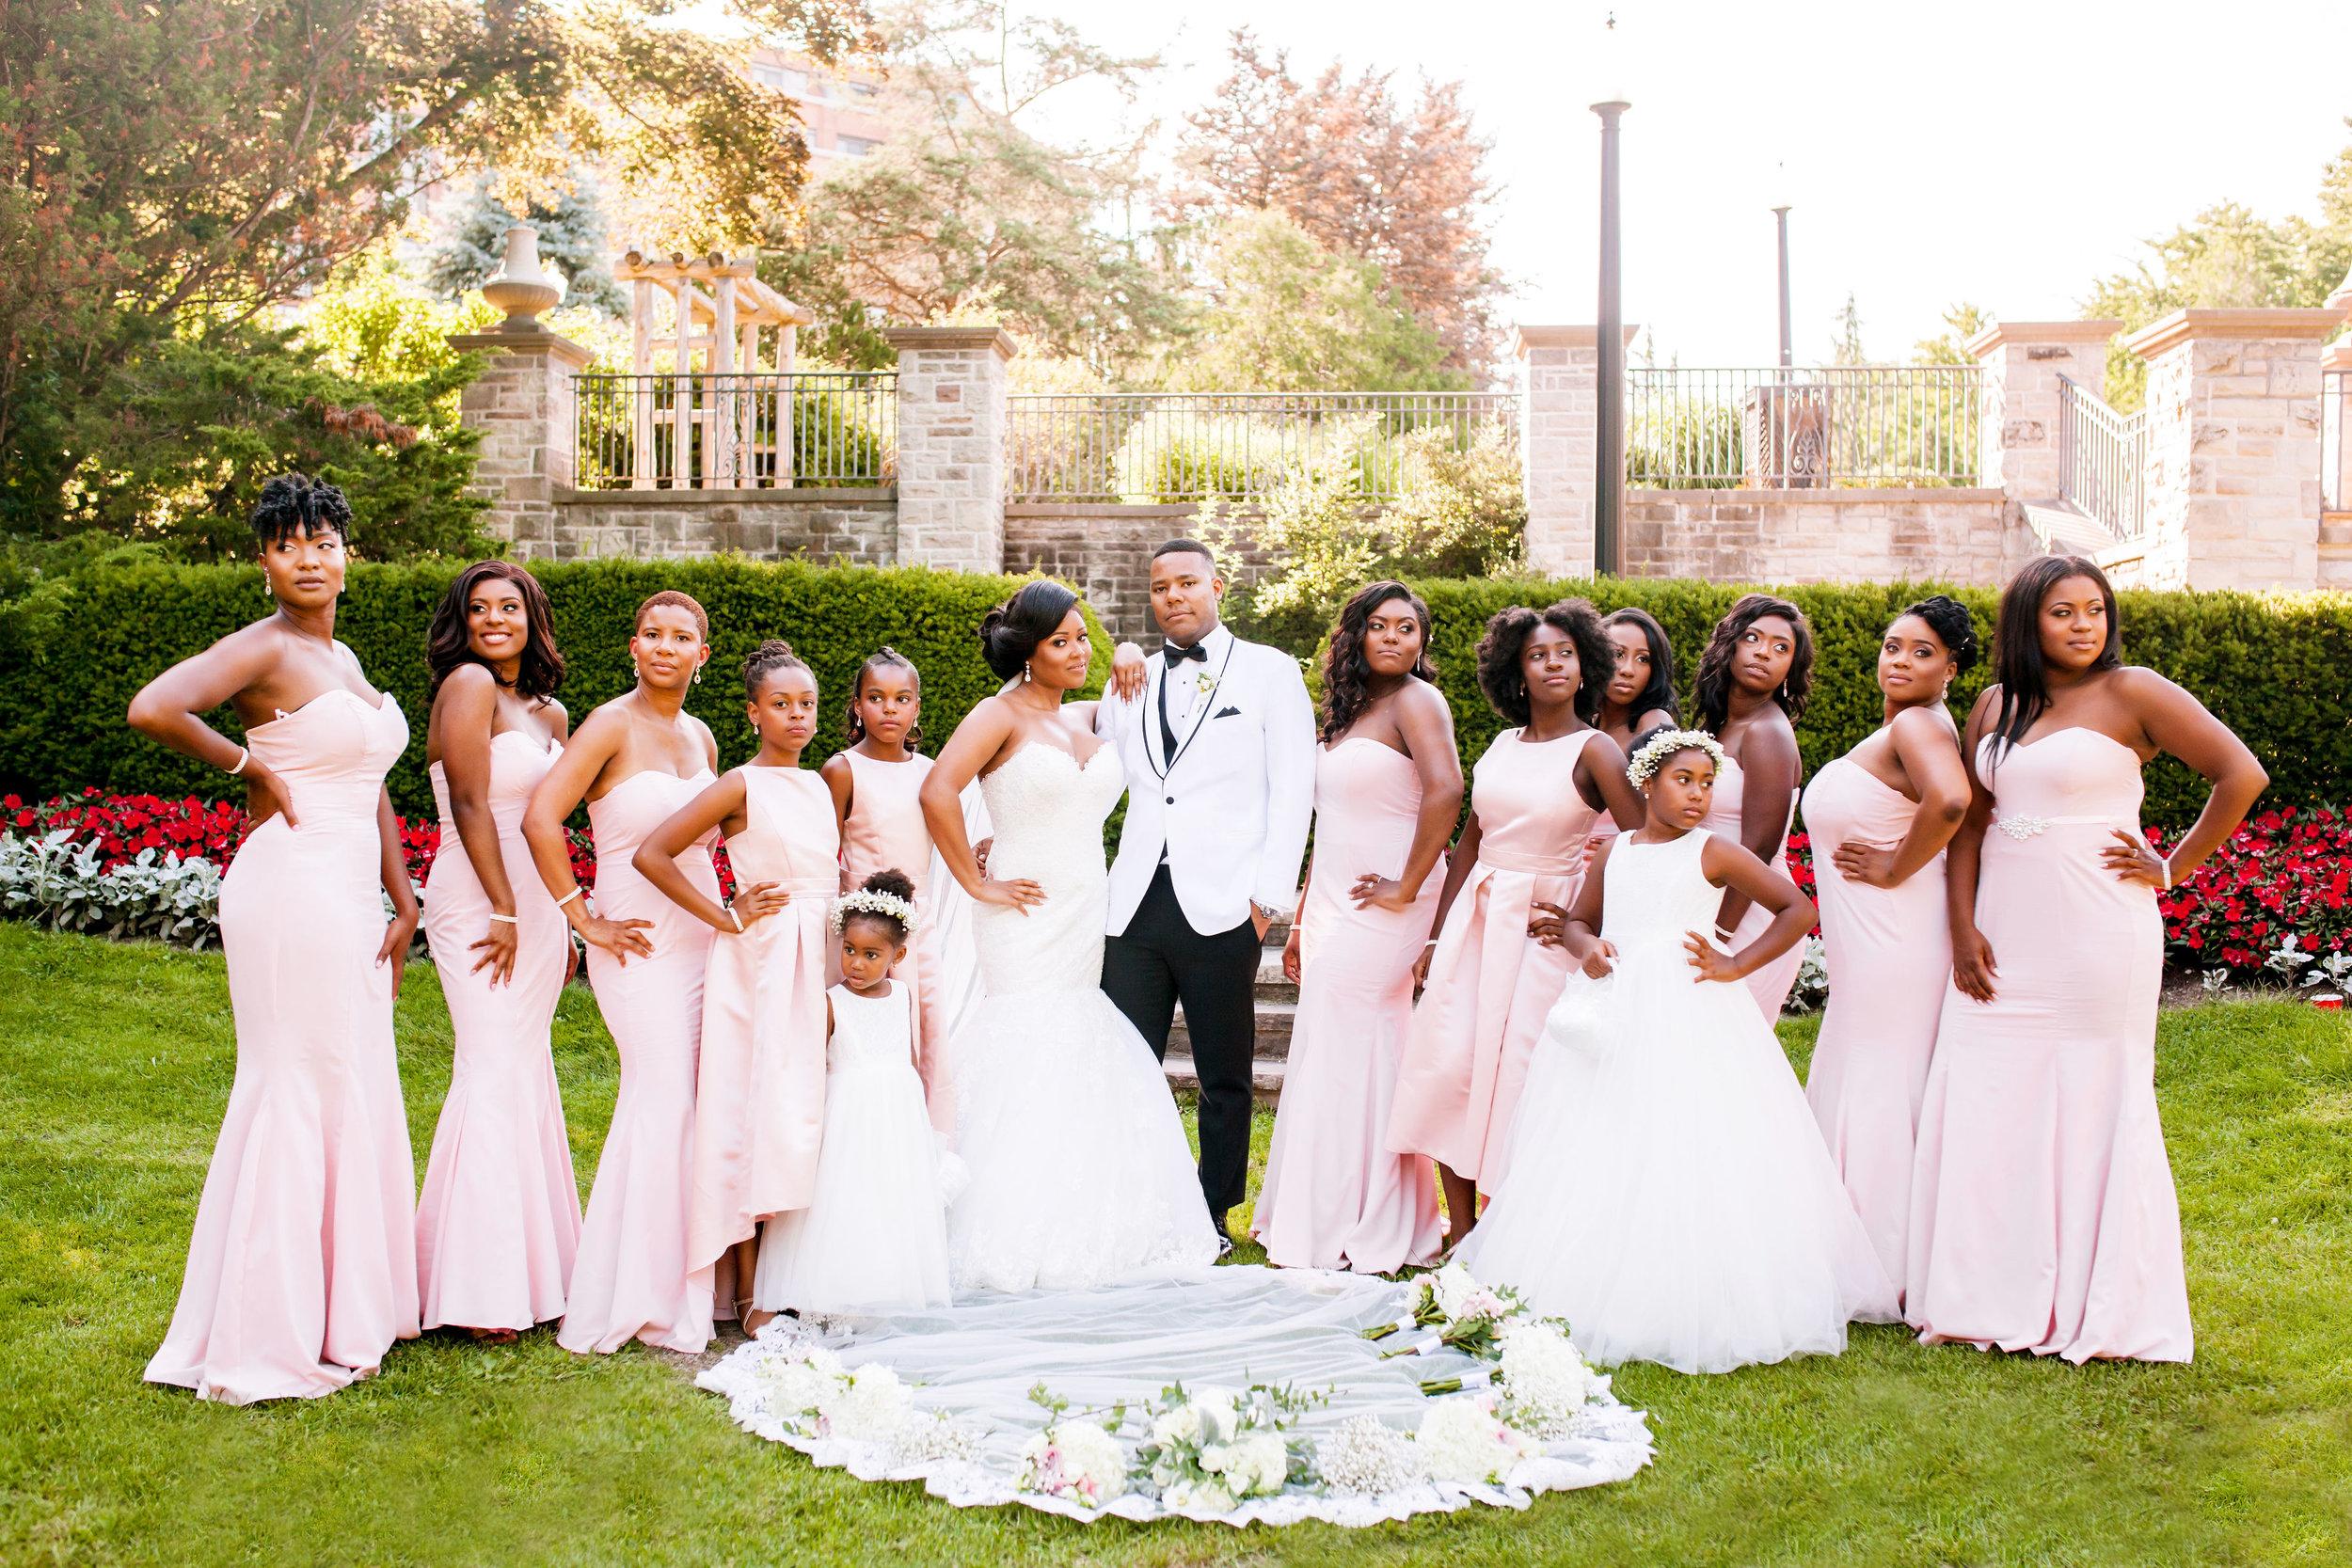 Lavinia_Carl_Wedding_Paradise_Banquet_Hall_Karimah_Gheddai_Photography_10